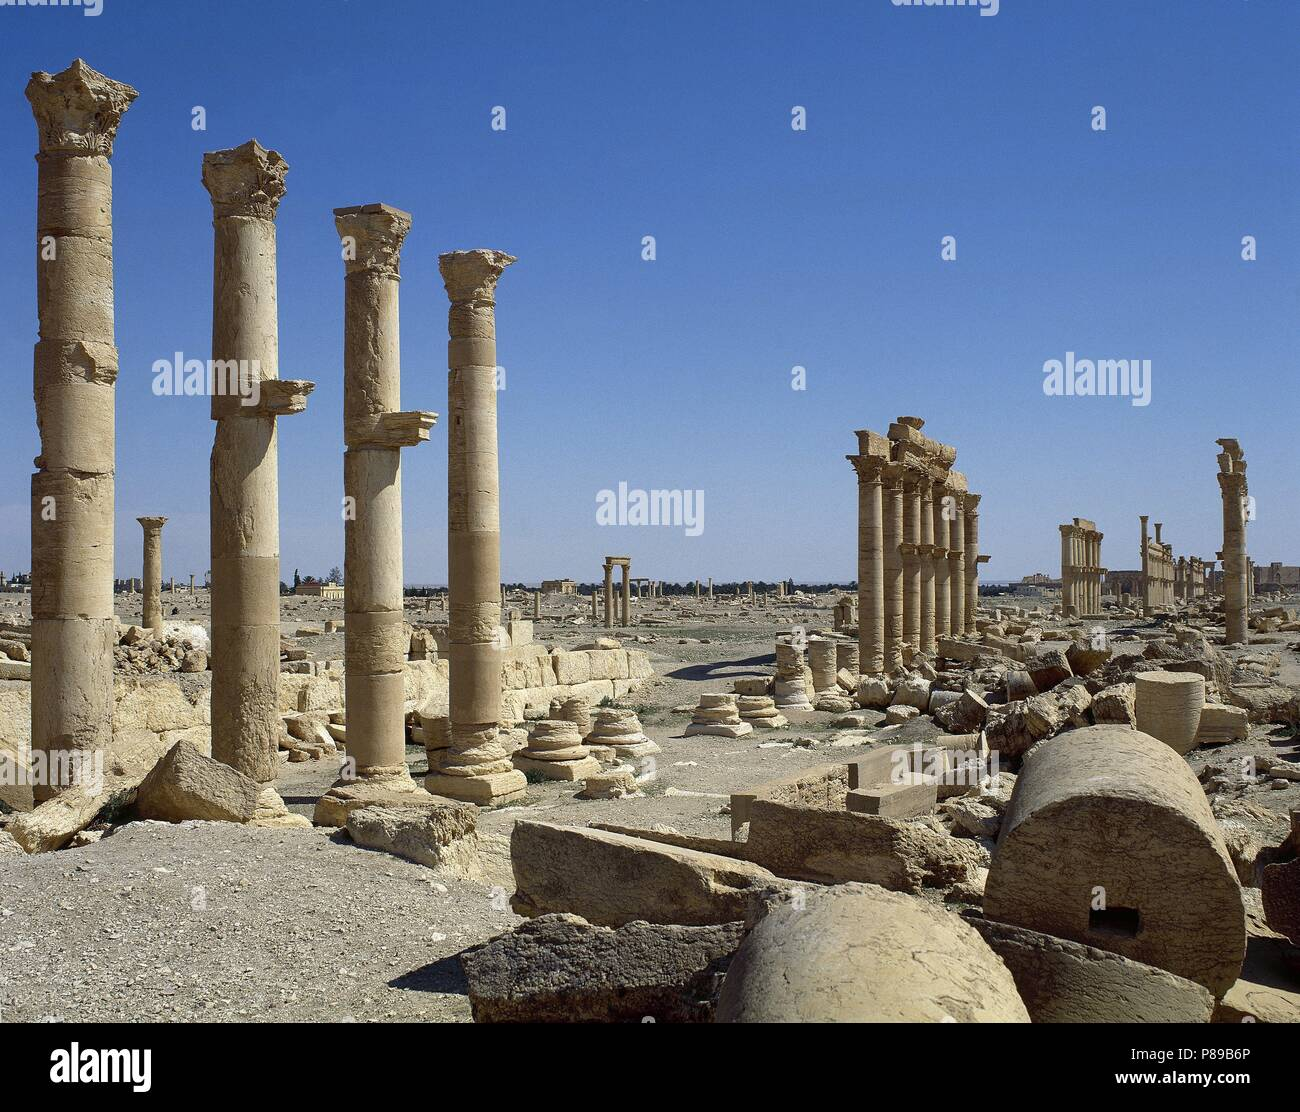 Syria Palmyra City The Great Colonnade Roman Empire Ruins Tadmur